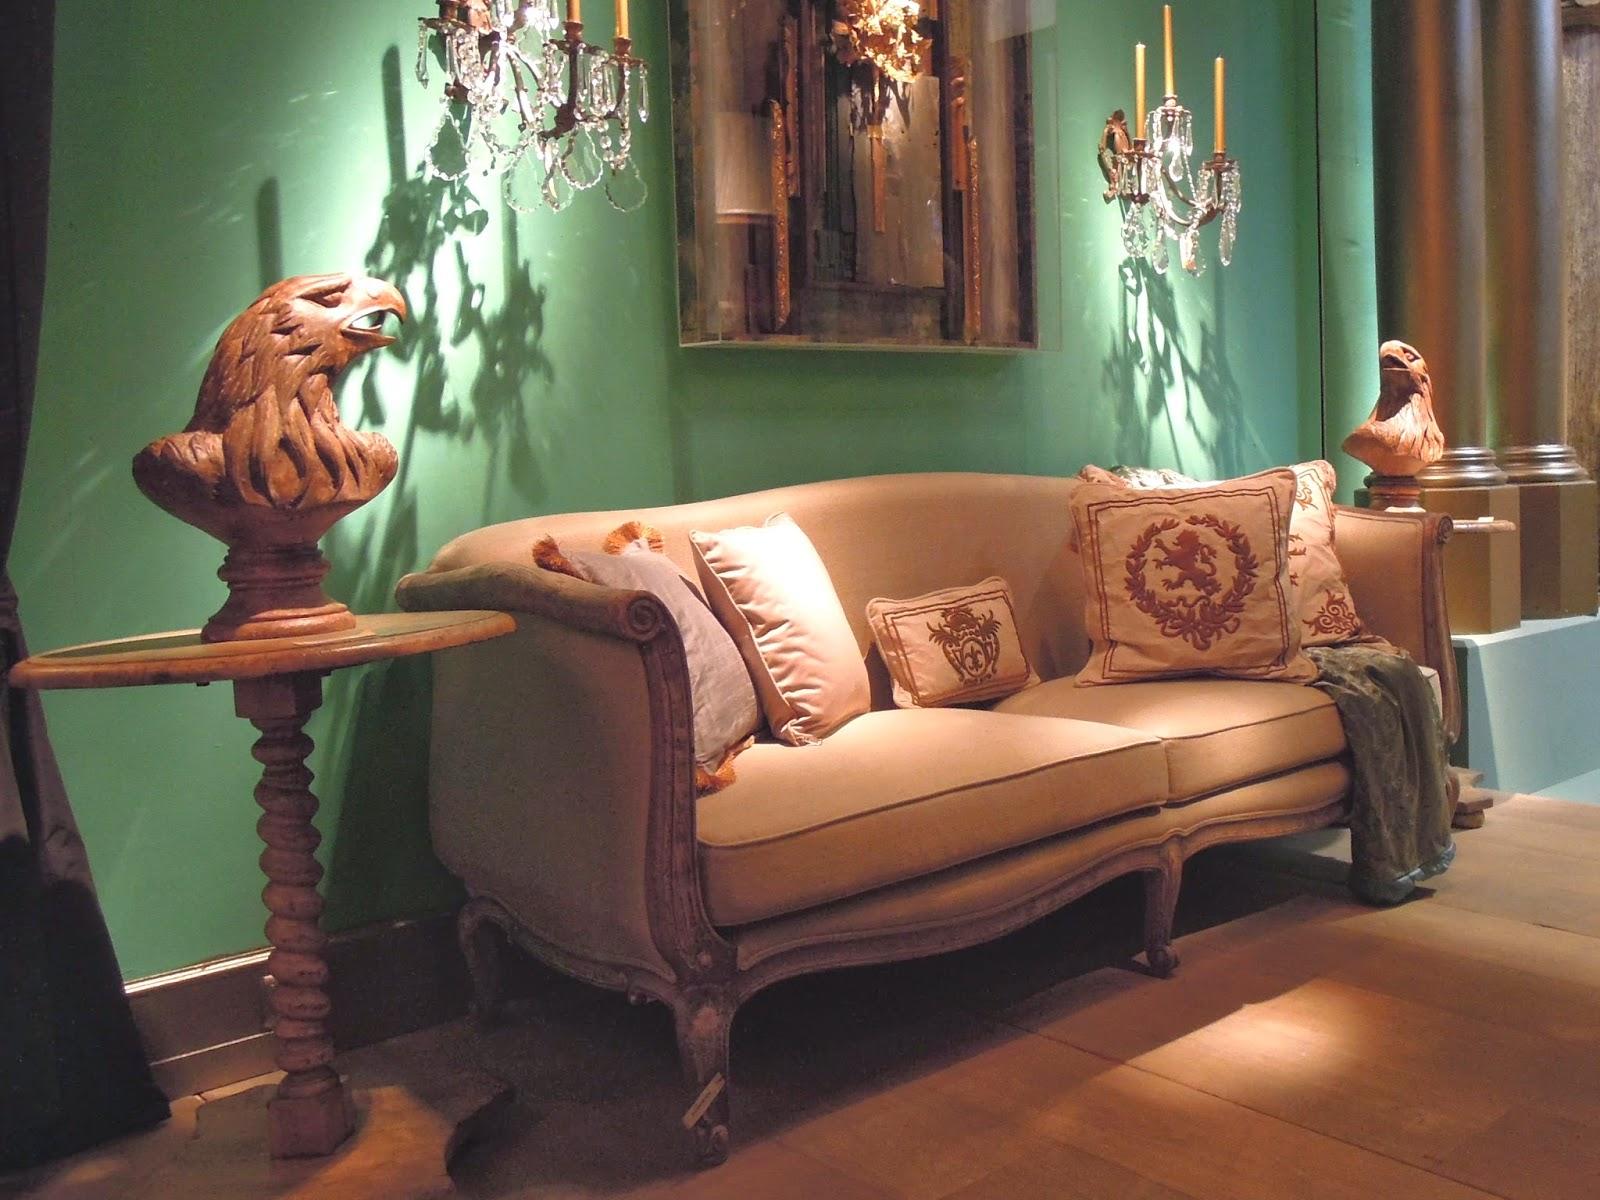 burlina maison ibiza home interiors abril 2014 belle maison home tour feminine elegance